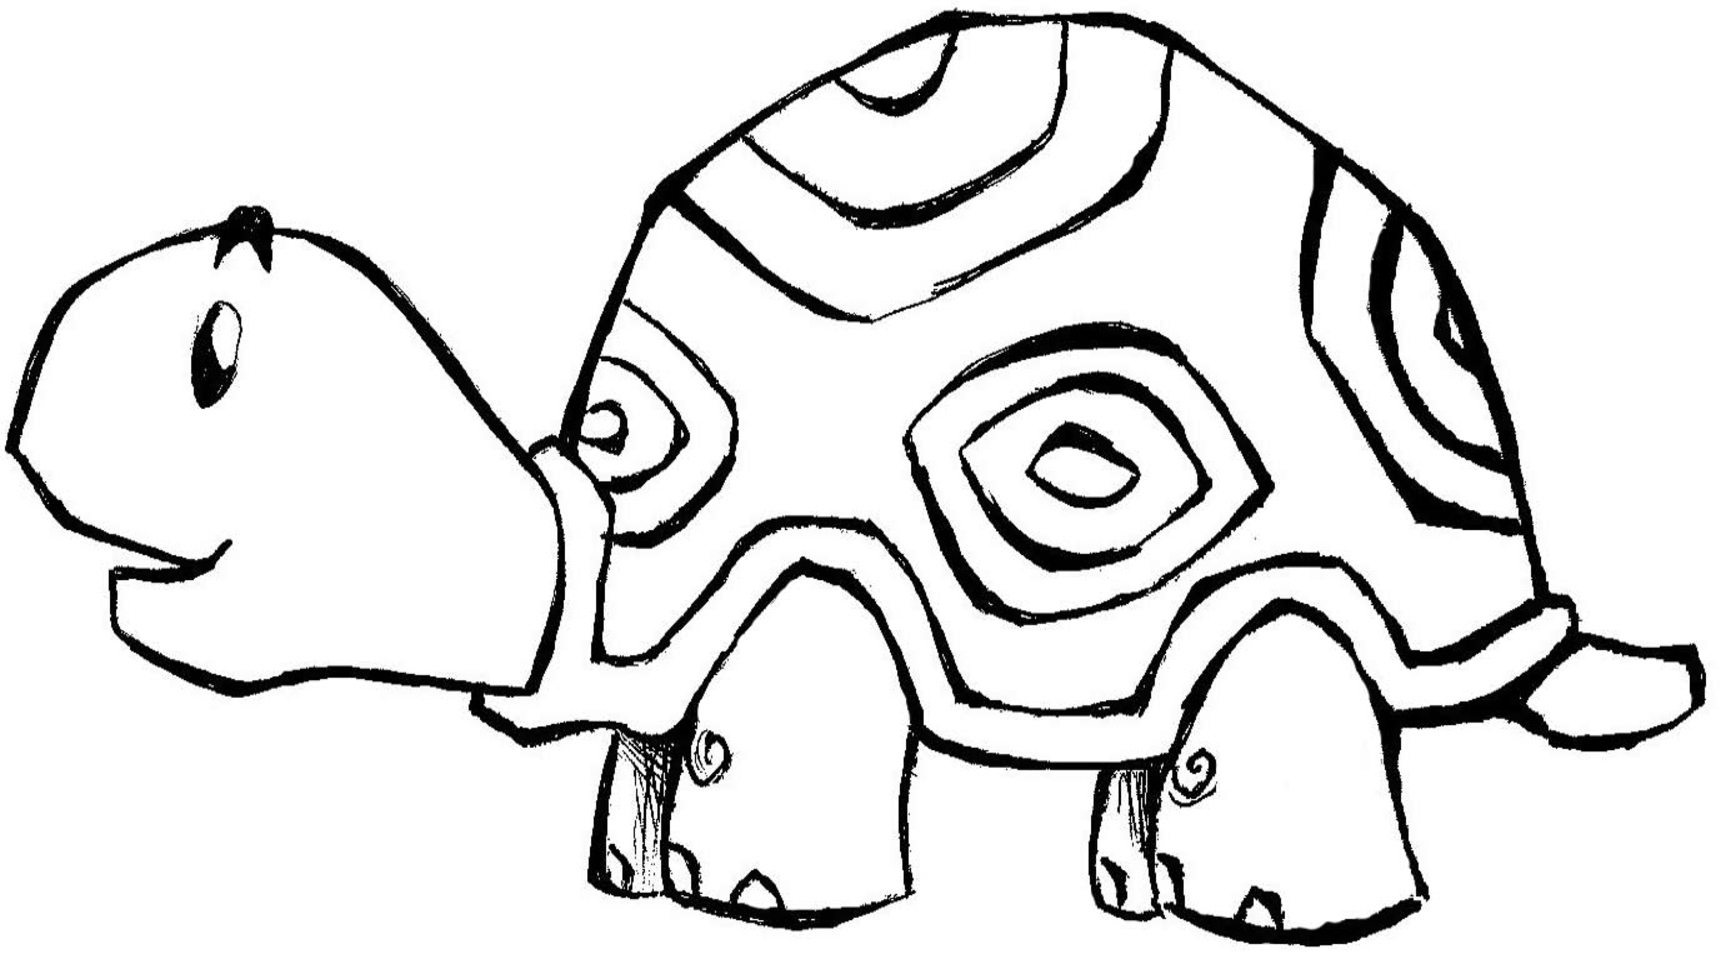 1726x969 Drawing Site For Kids Drawing Site For Kids Drawing Games Ab